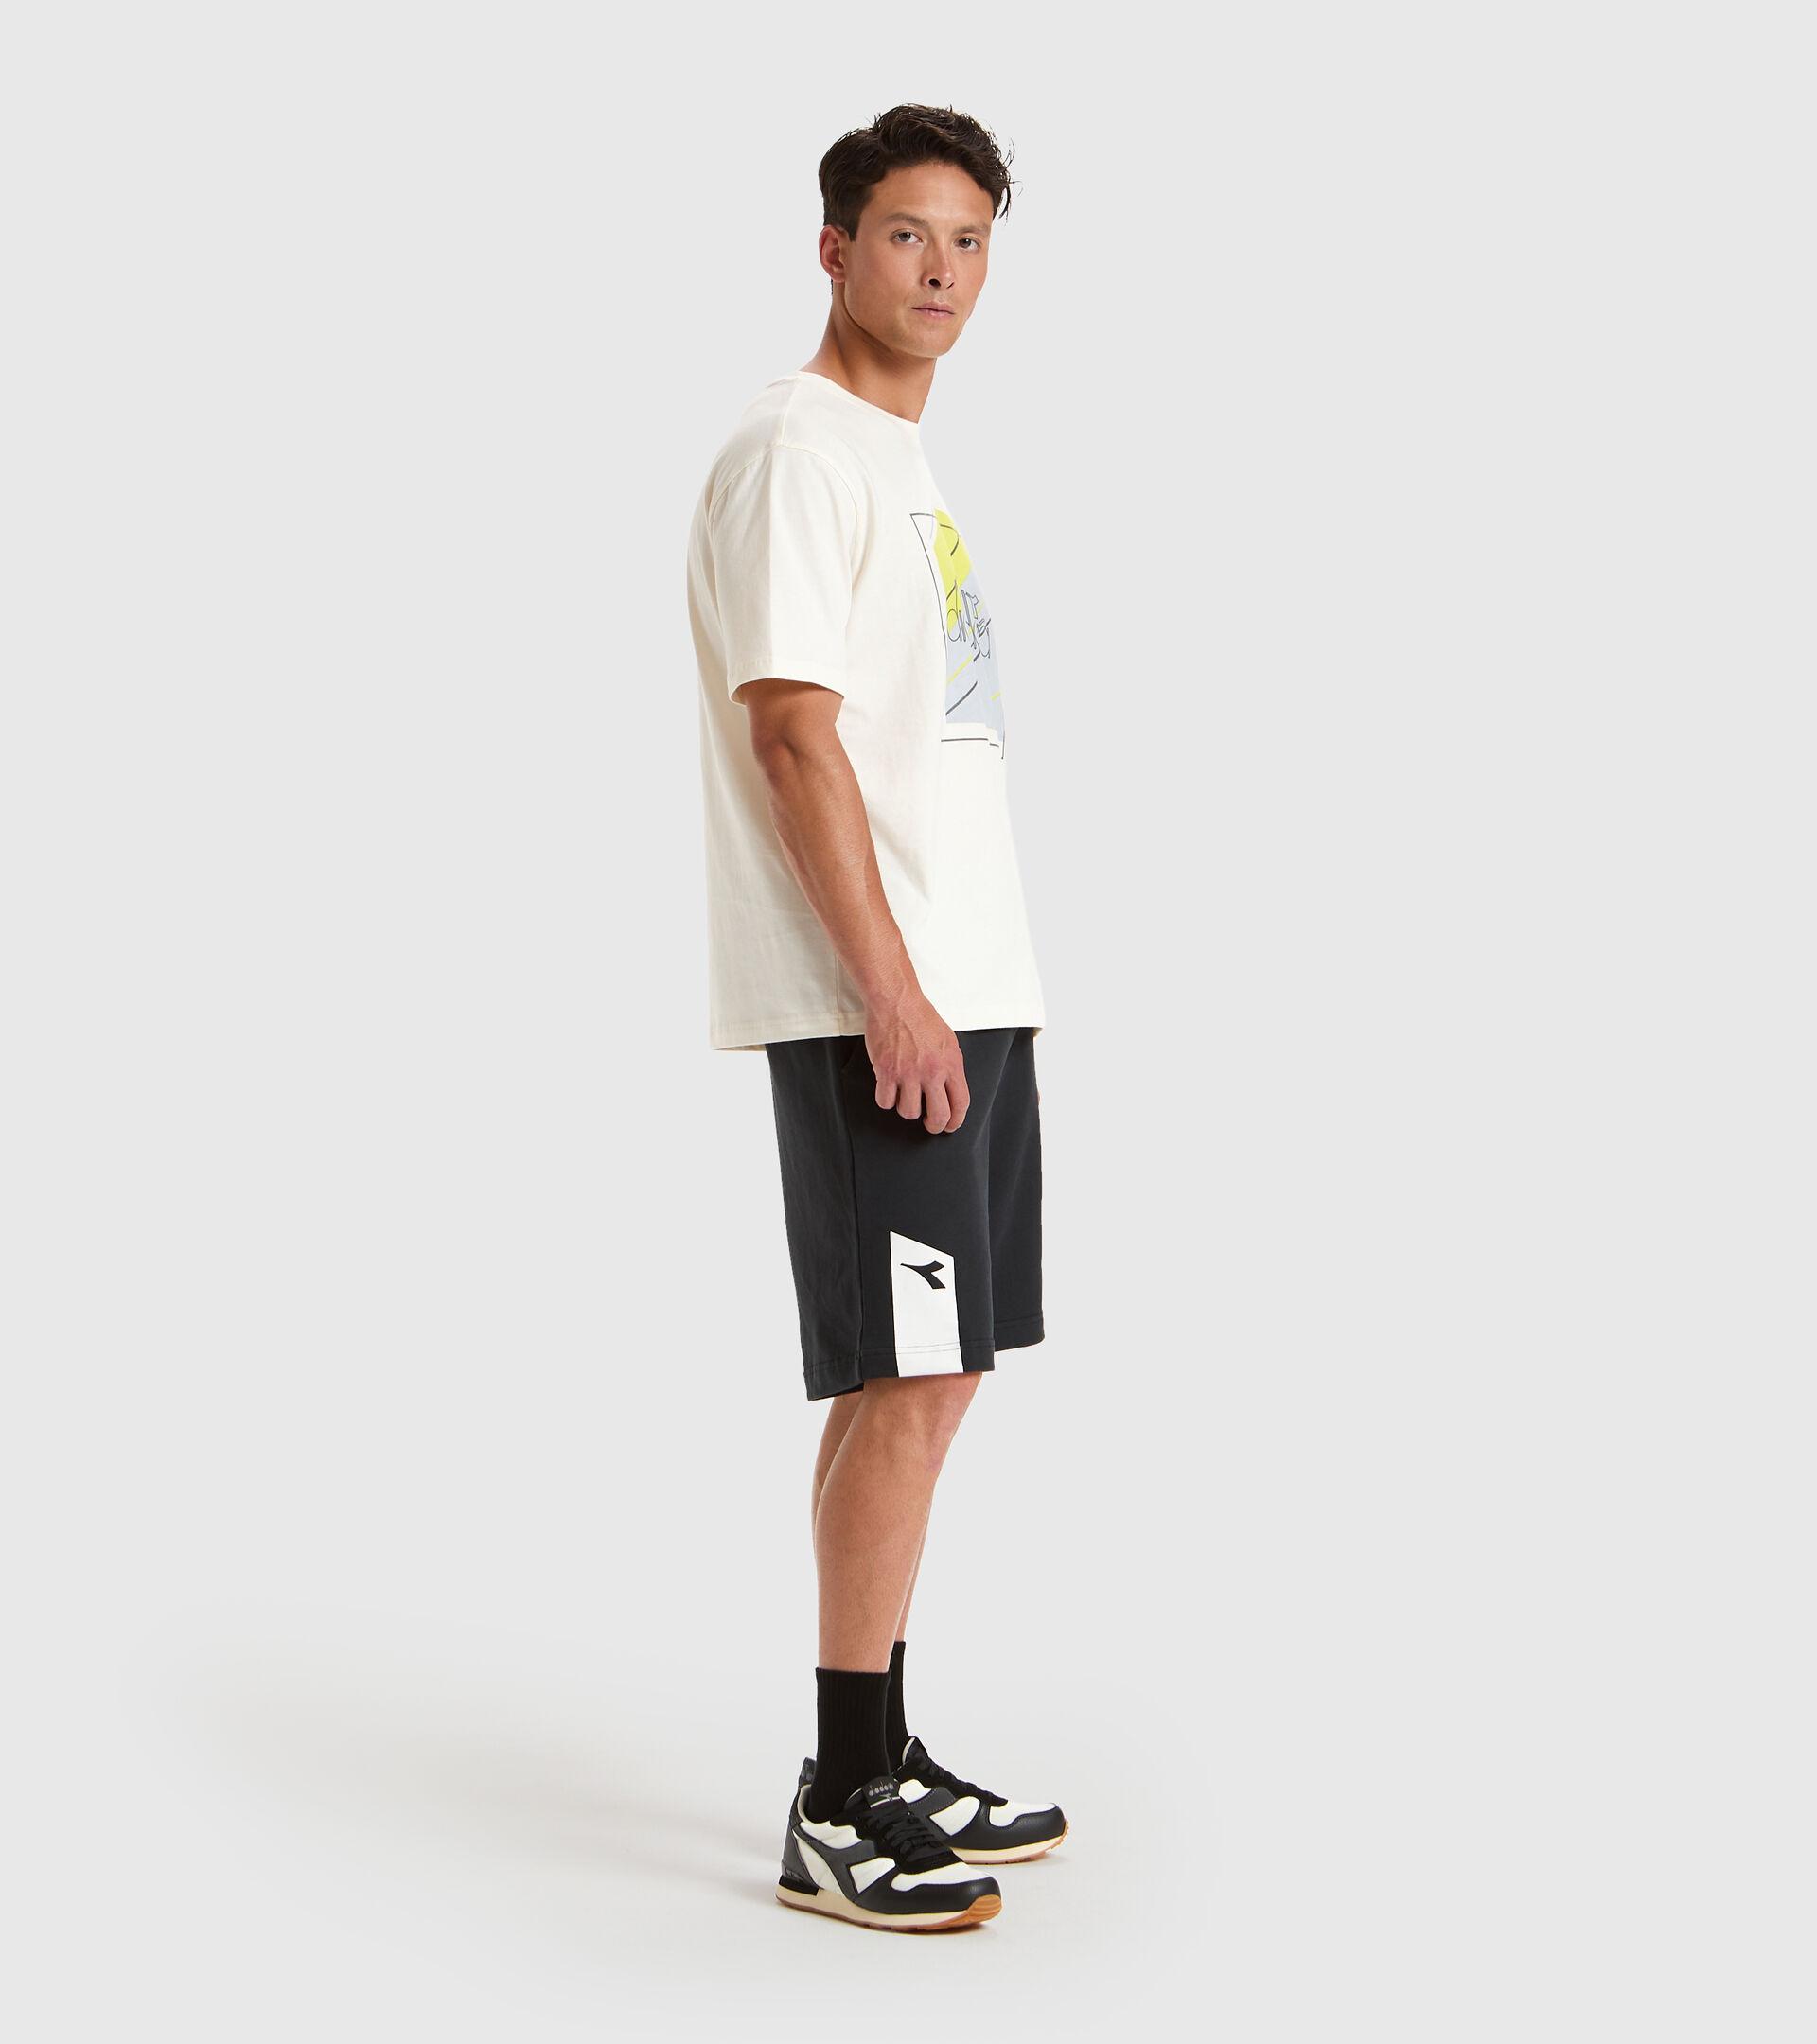 Apparel Sportswear UOMO T-SHIRT SS 5PALLLE URBANITY BLANCO Diadora